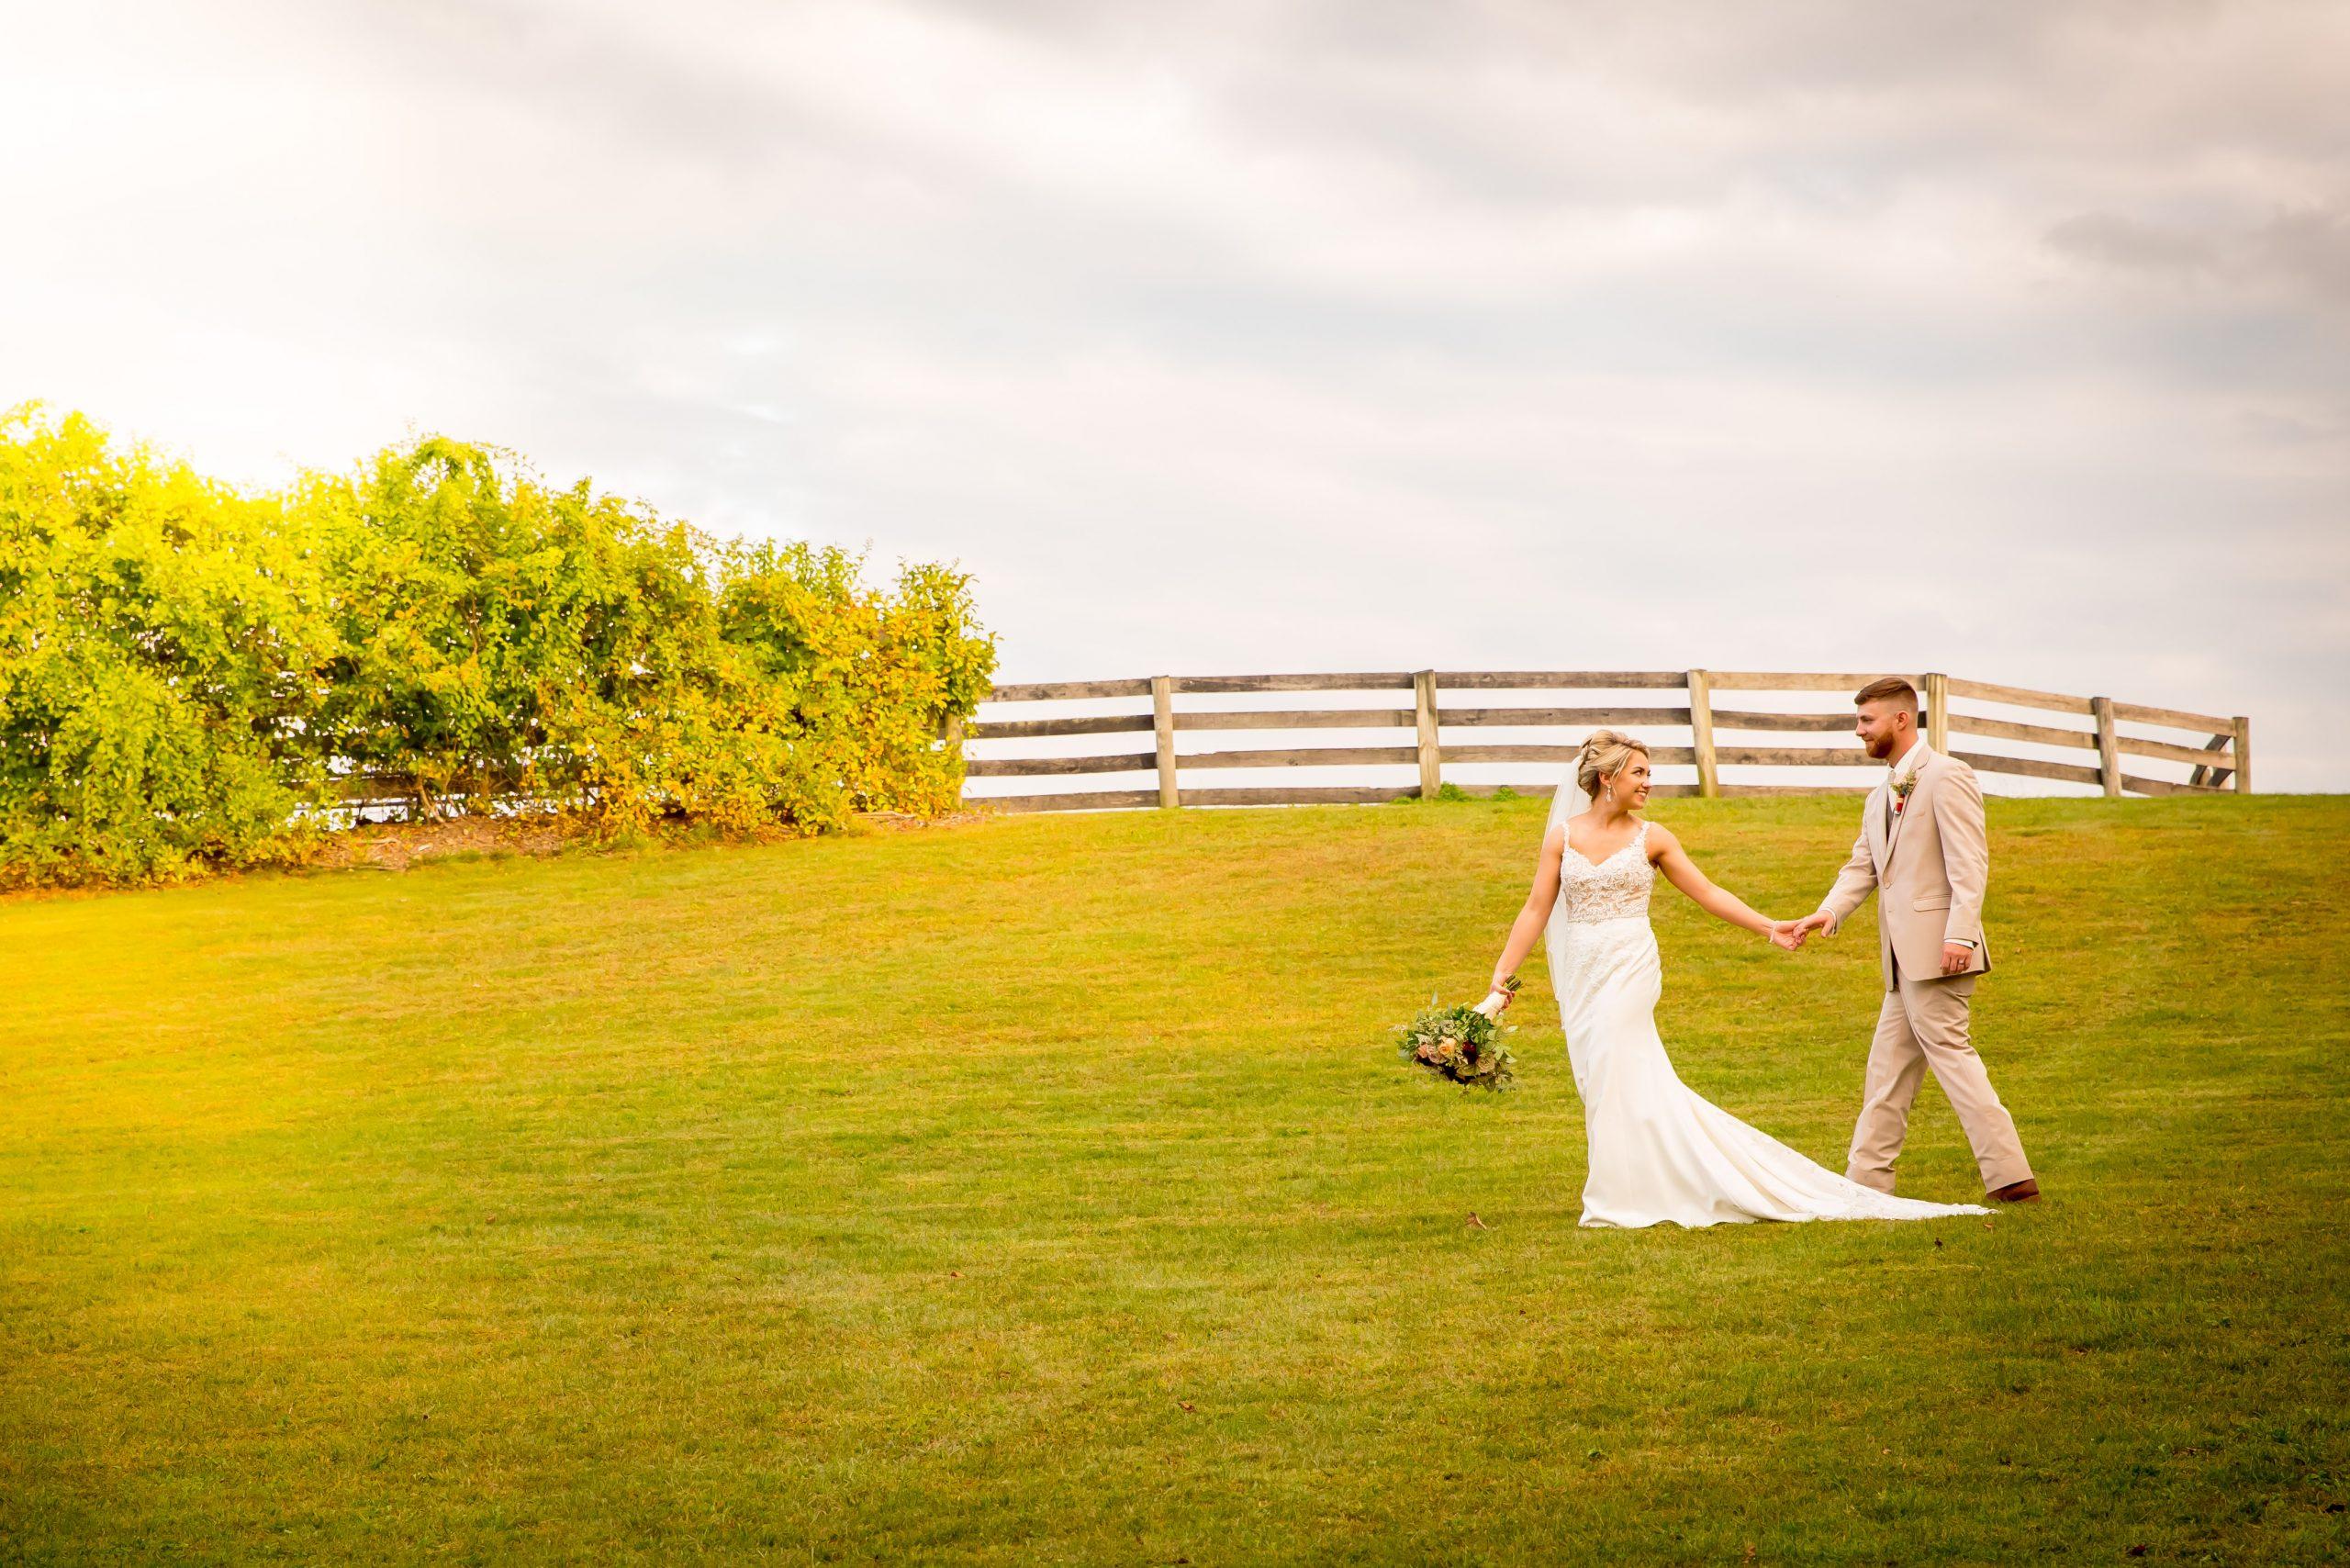 liberty_ridge_wedding52.jpg